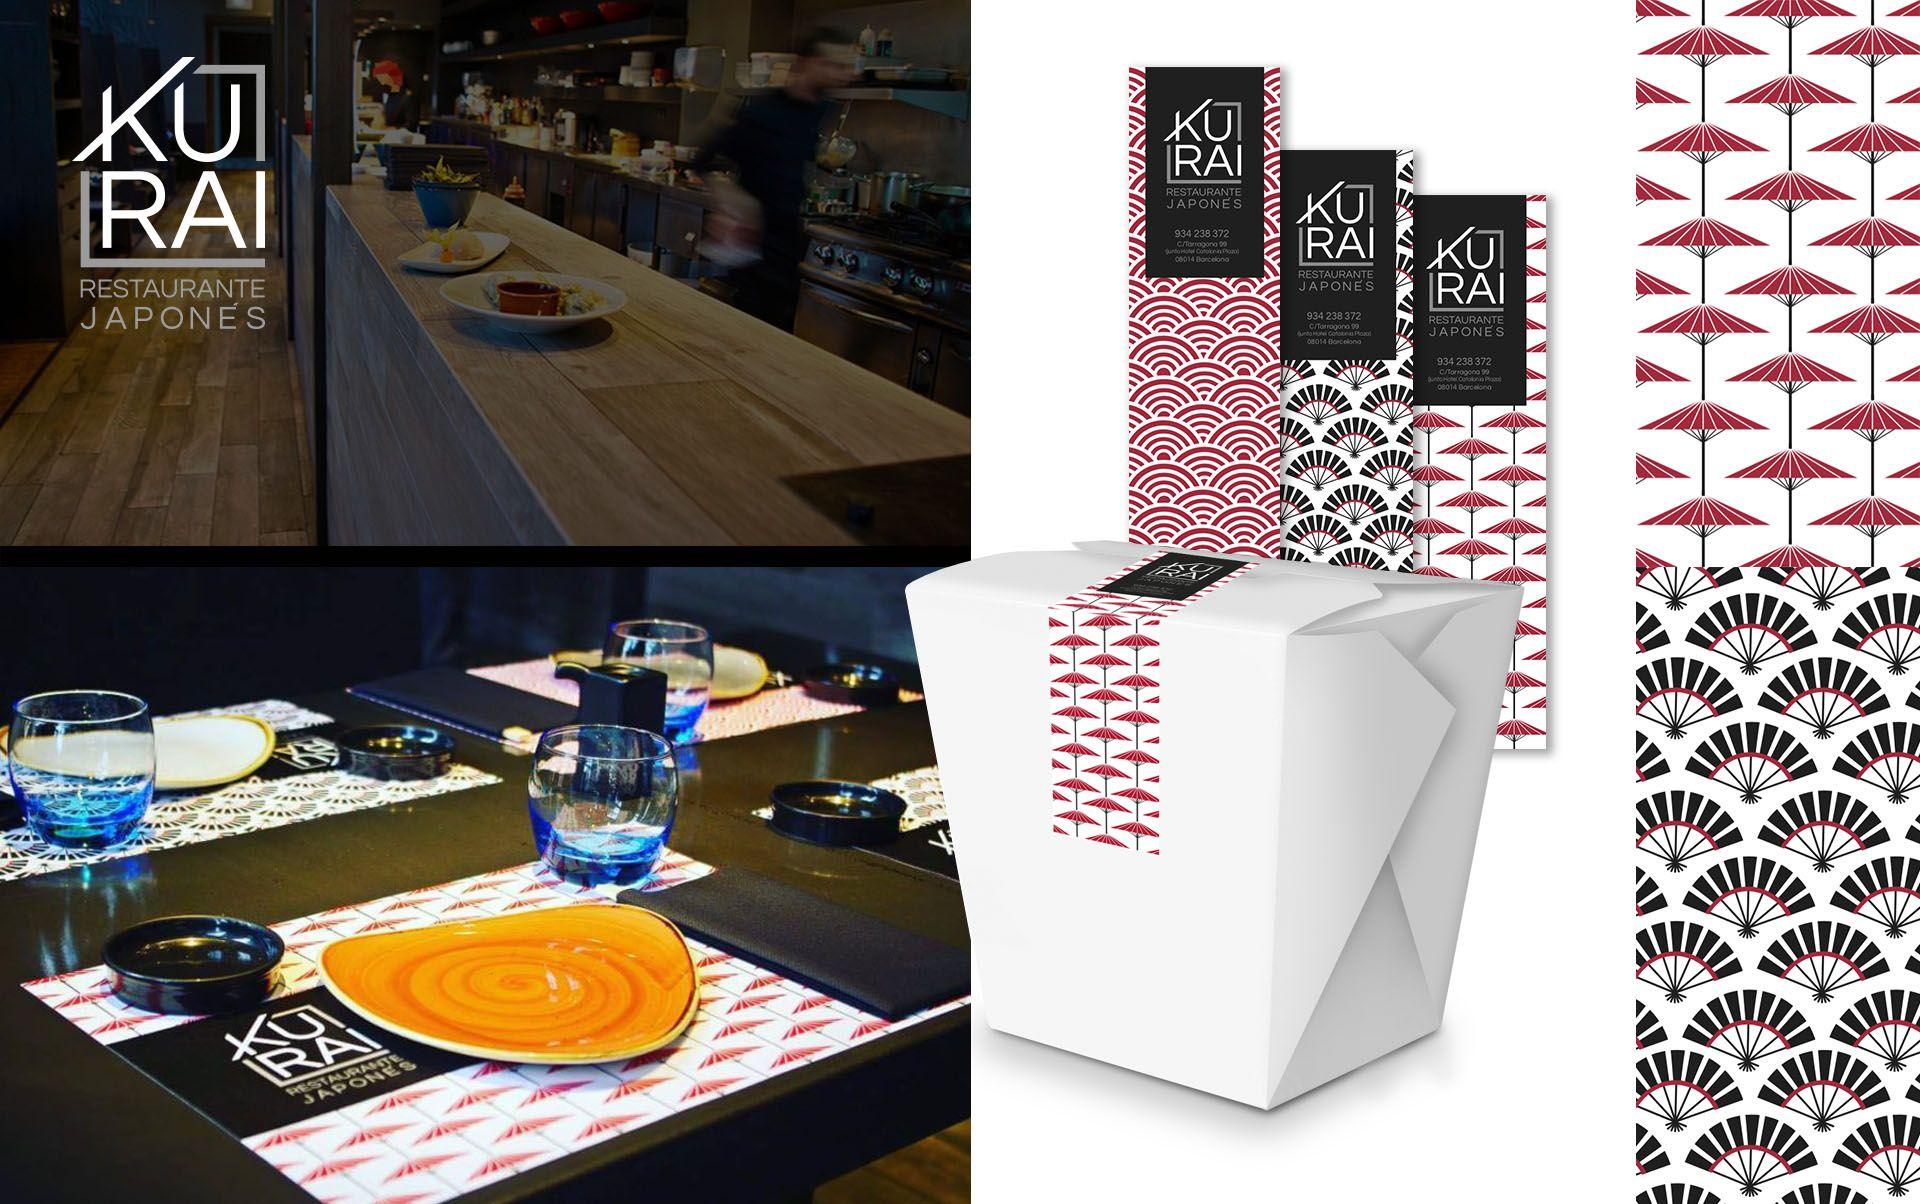 03 Creacion de marca para restaurante en barcelona - Creación de branding para restaurante